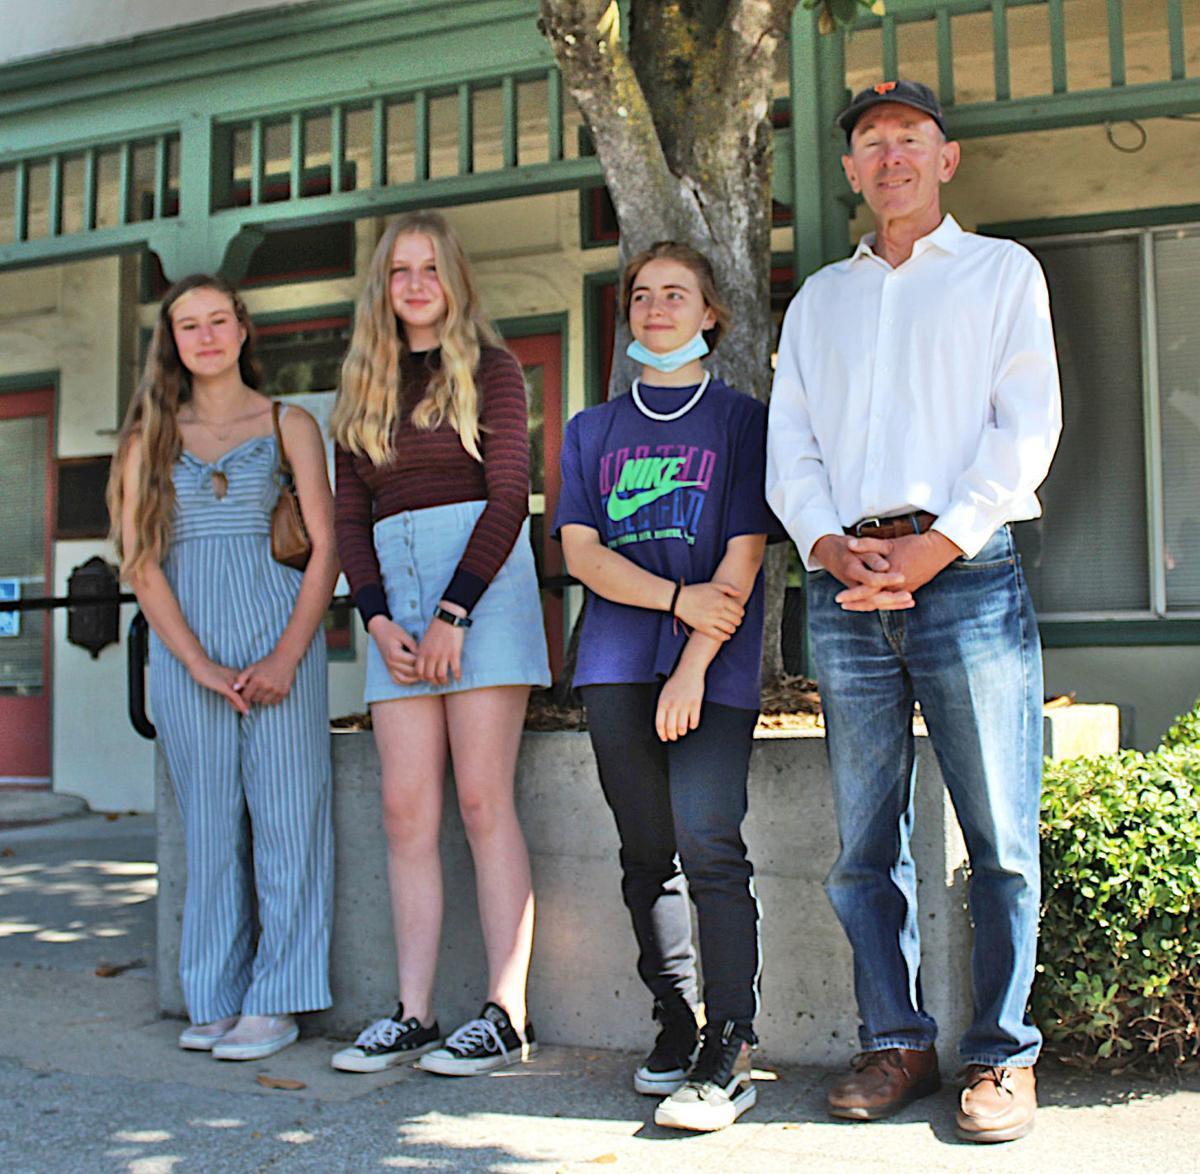 Calistoga Government Essay winners